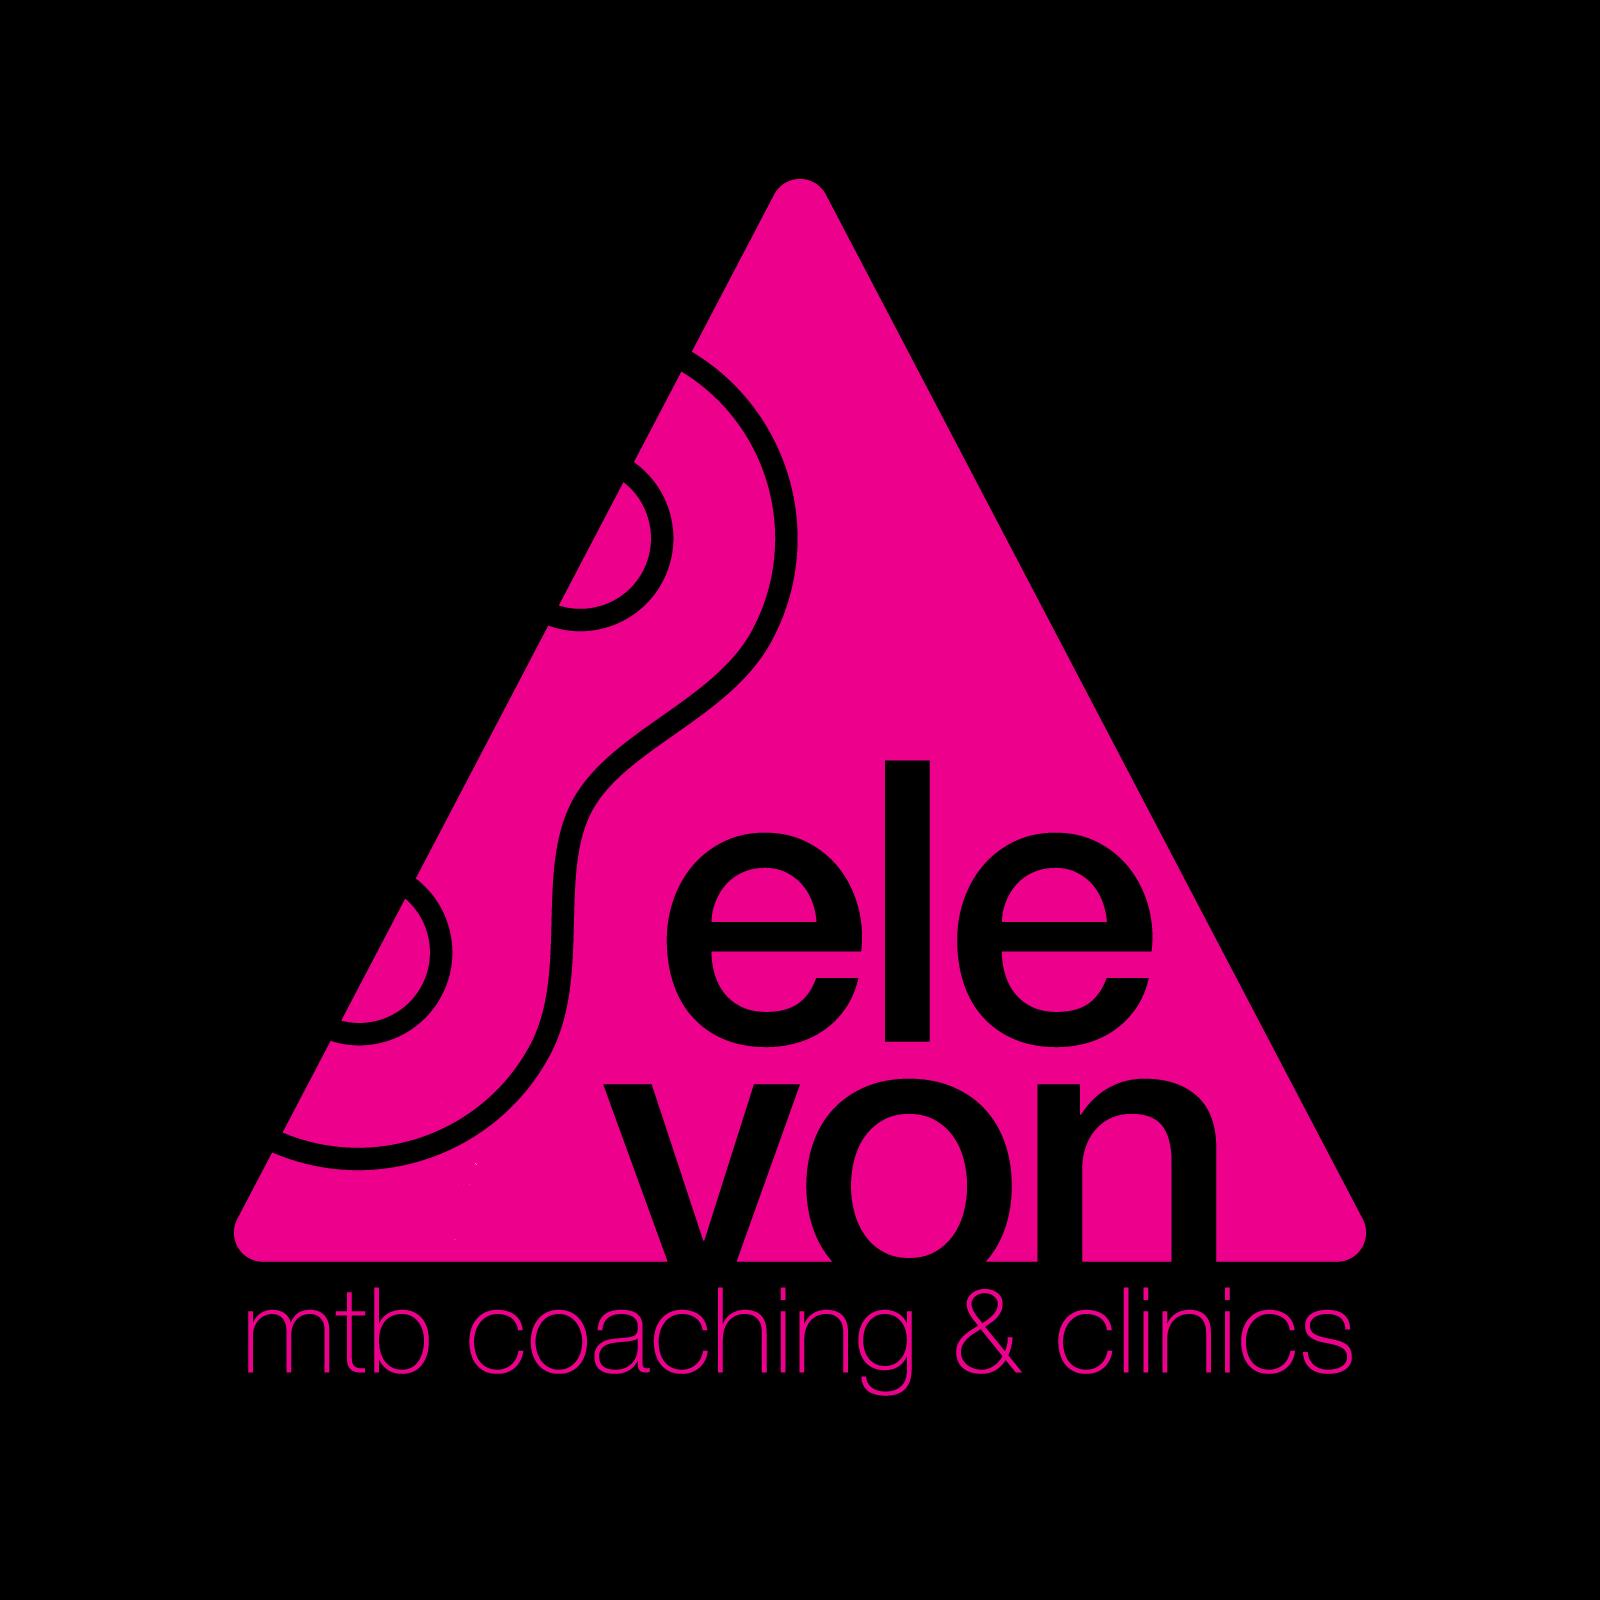 Elevon MTB Coaching and Clinics